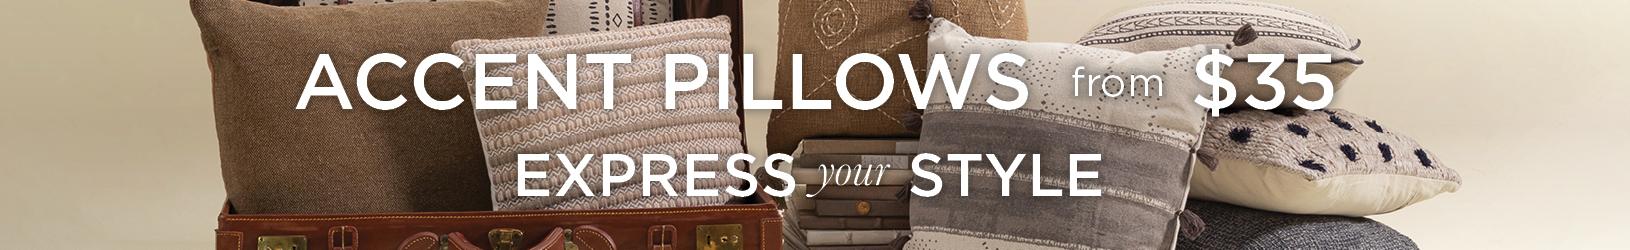 New Accent Pillows